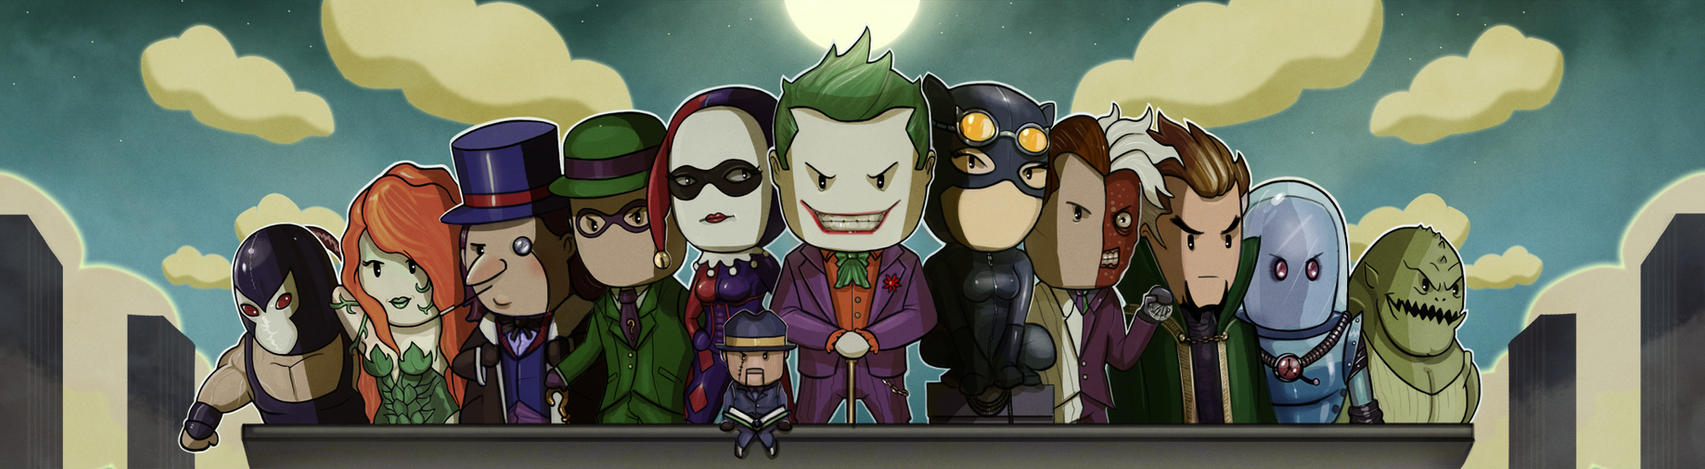 Batman Villains United by MattiasFahlberg